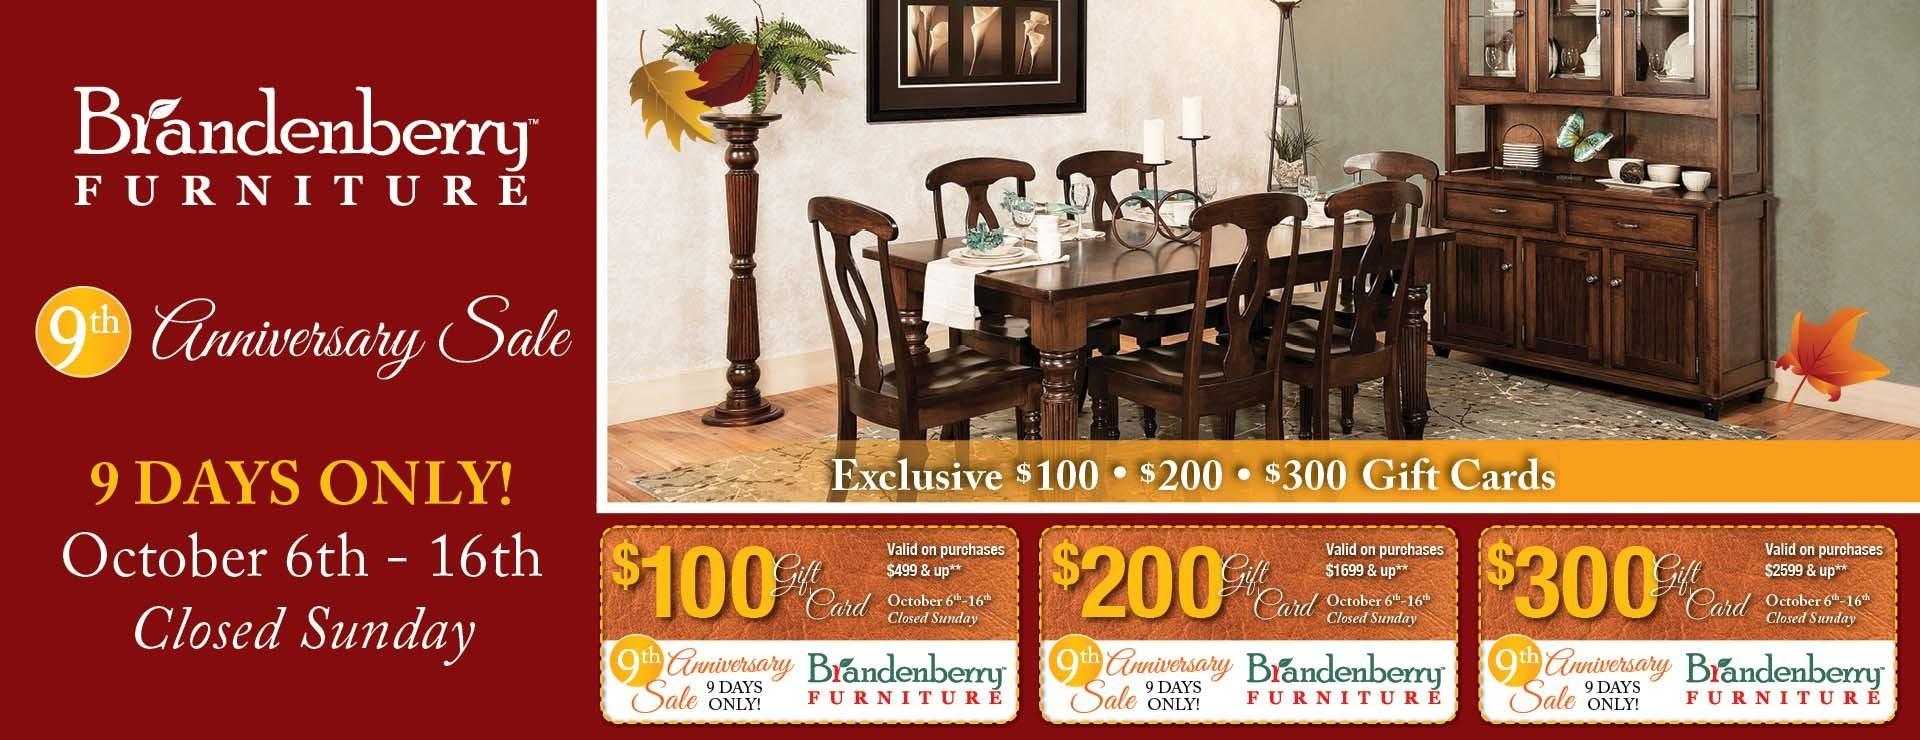 Brandenberry Amish Furniture Sale Information